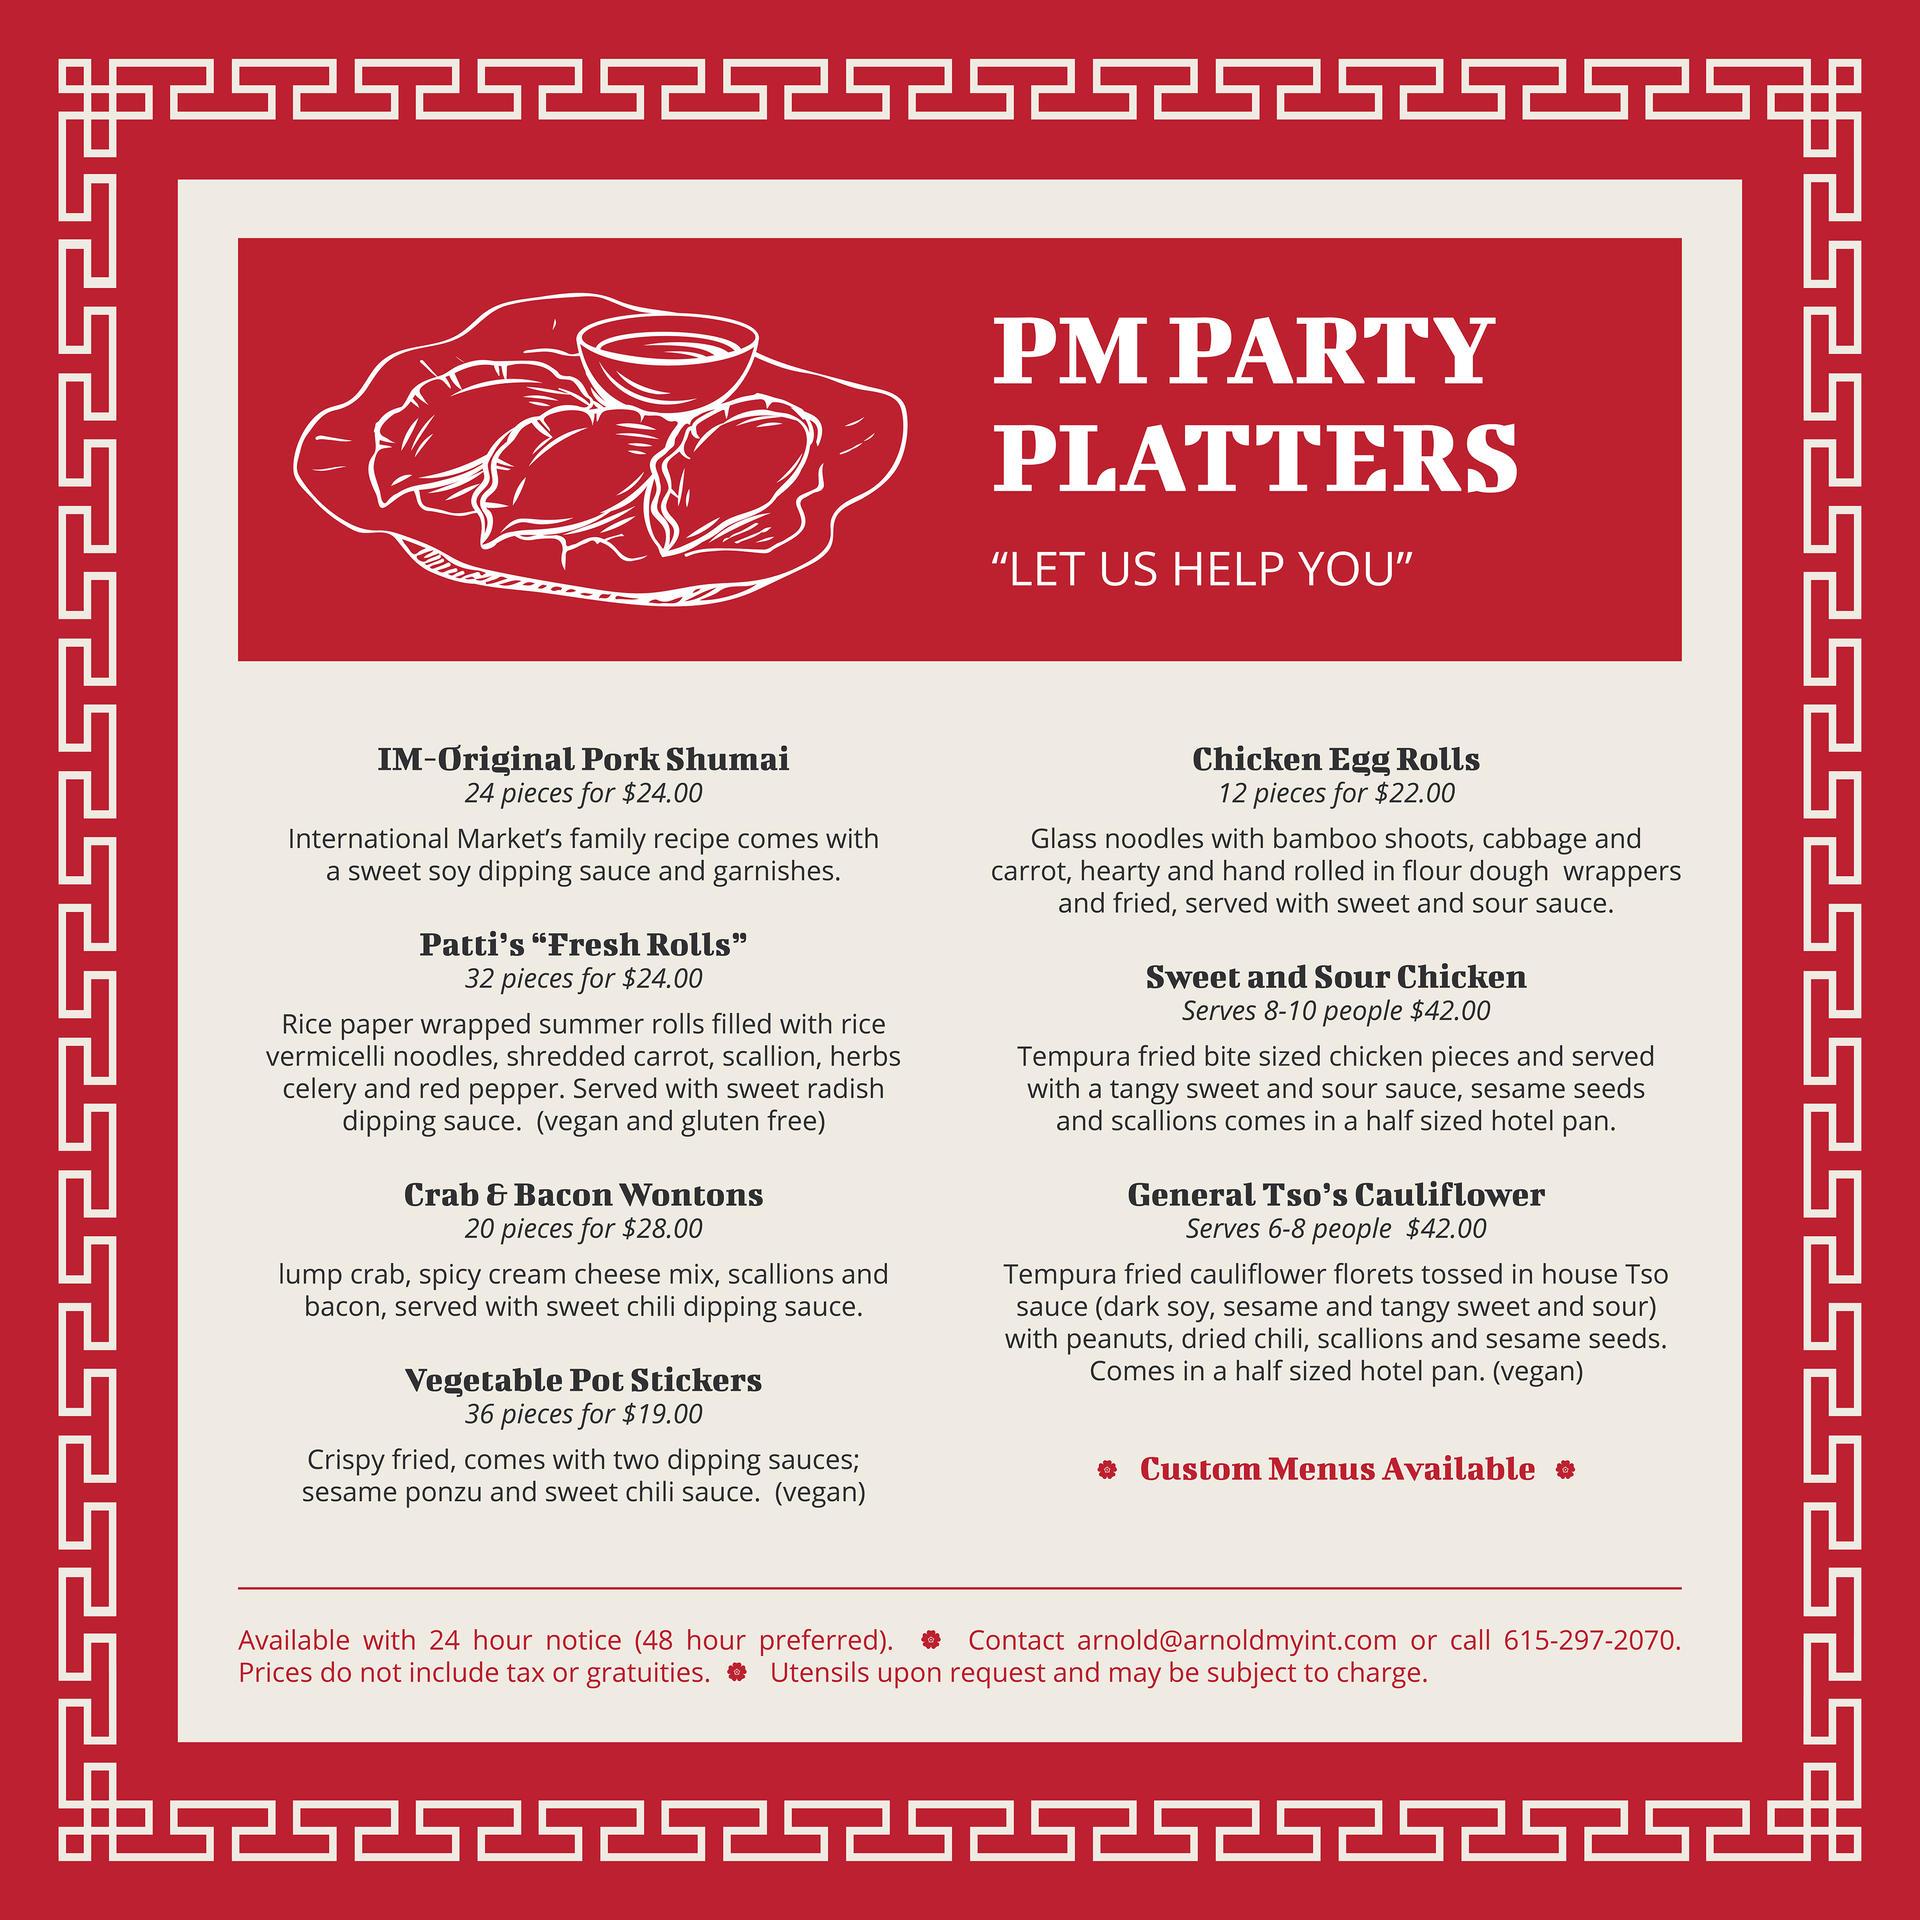 PM Party Platters